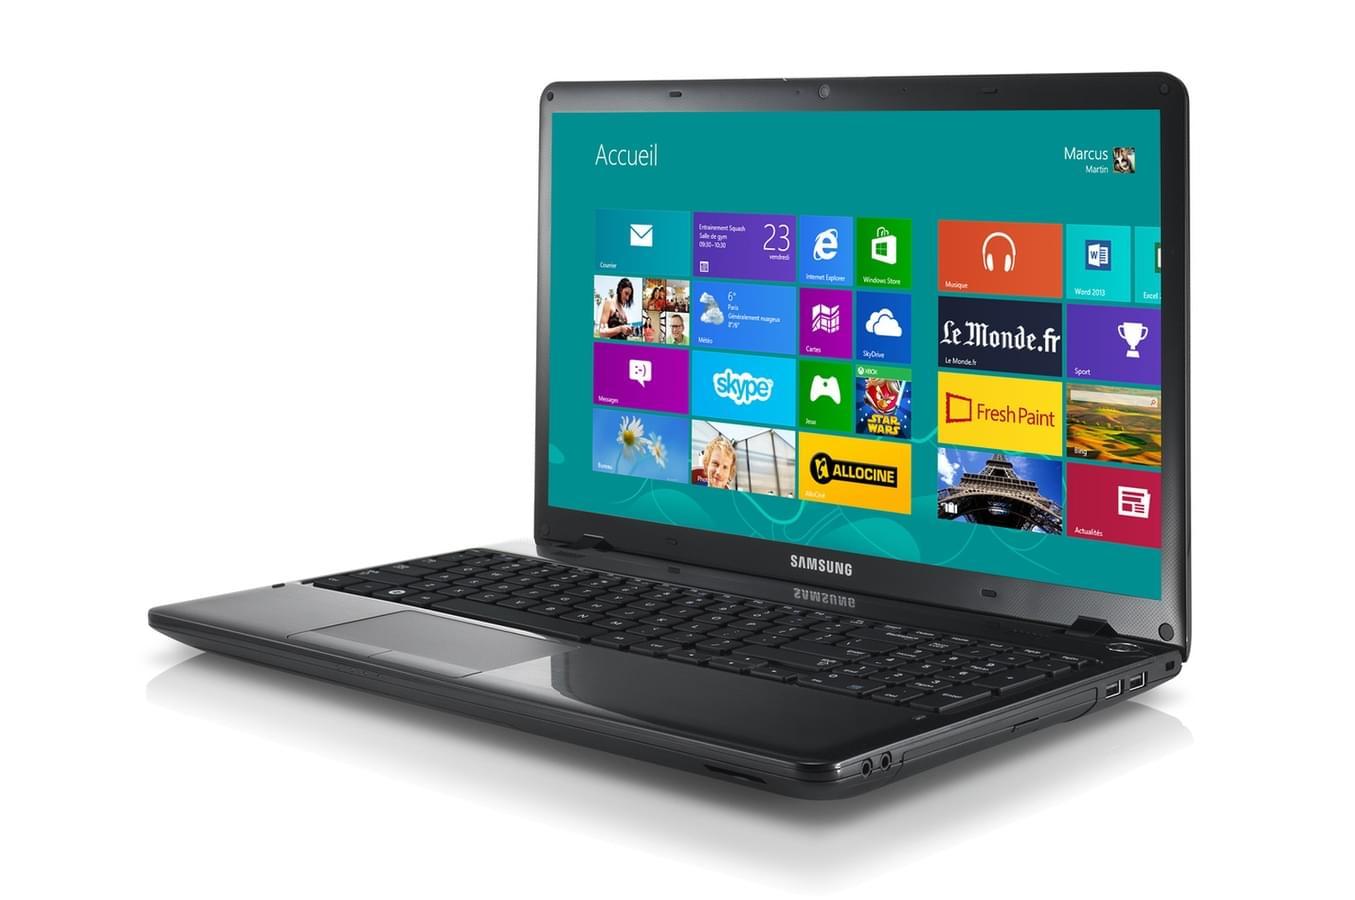 Samsung NP350E7C-S0DFR - PC portable Samsung - Cybertek.fr - 0